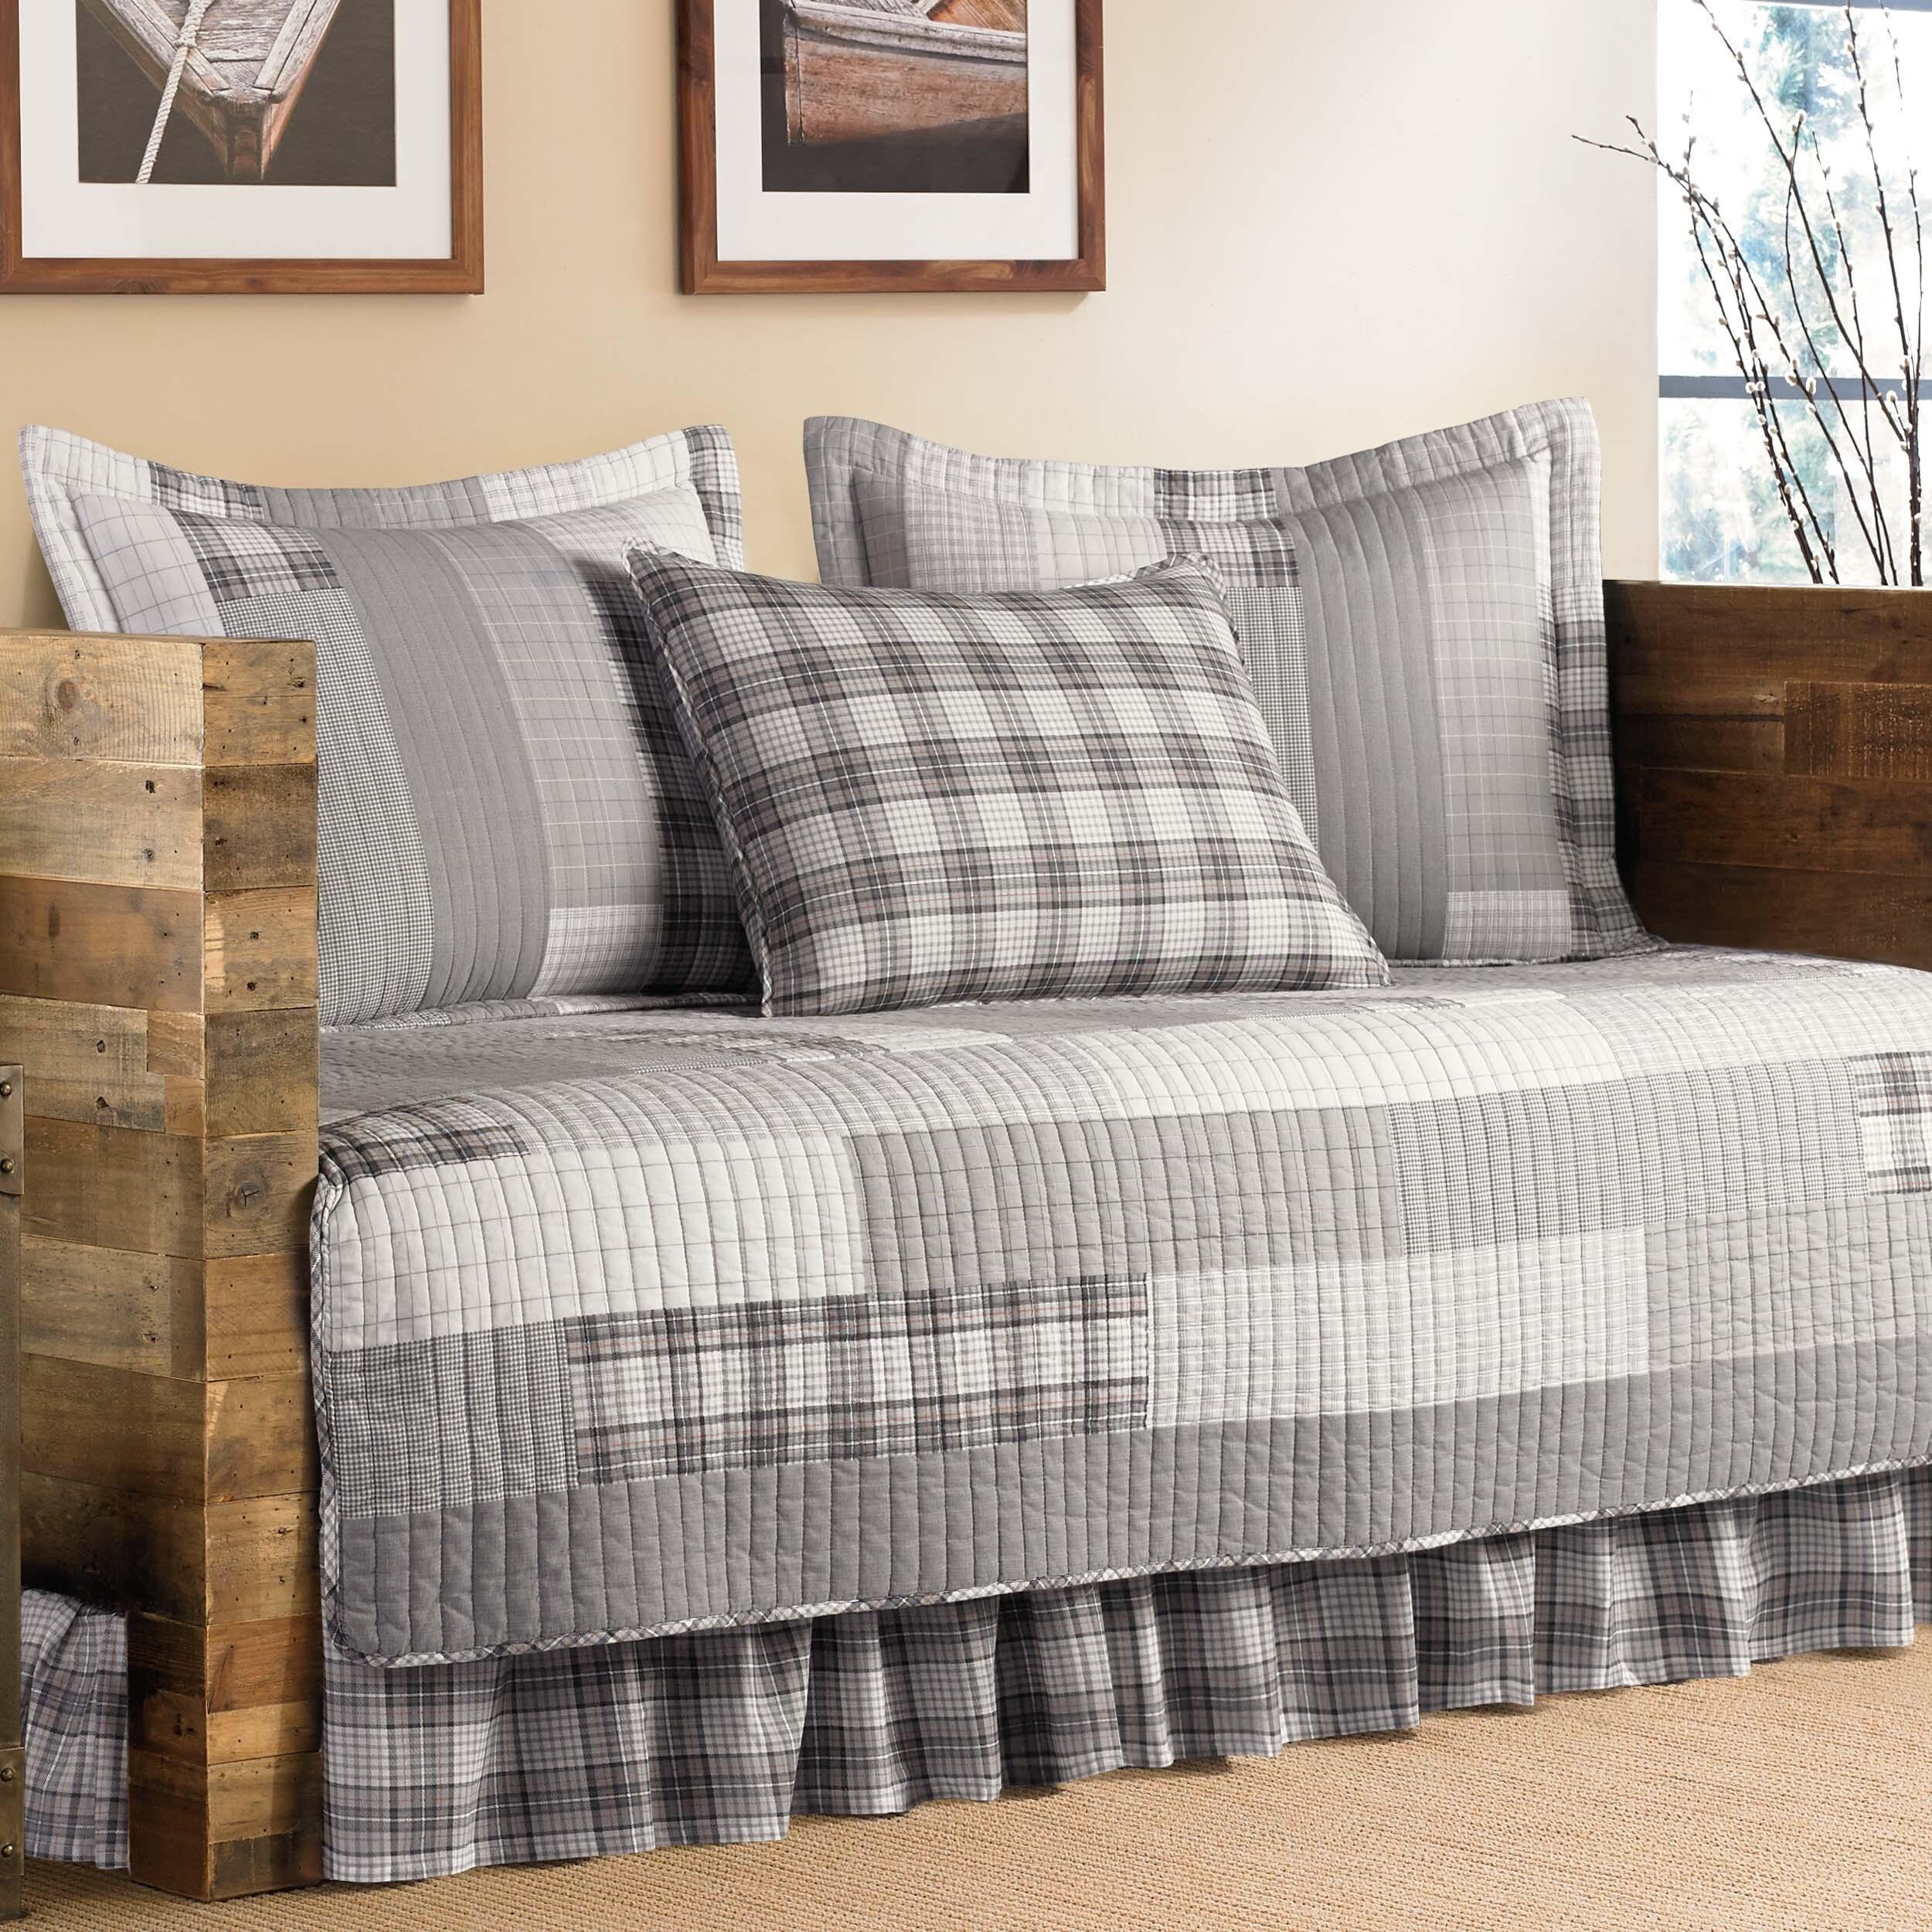 eddie bed bauer master cfm plaid hayneedle set bedding lewis product comforter by